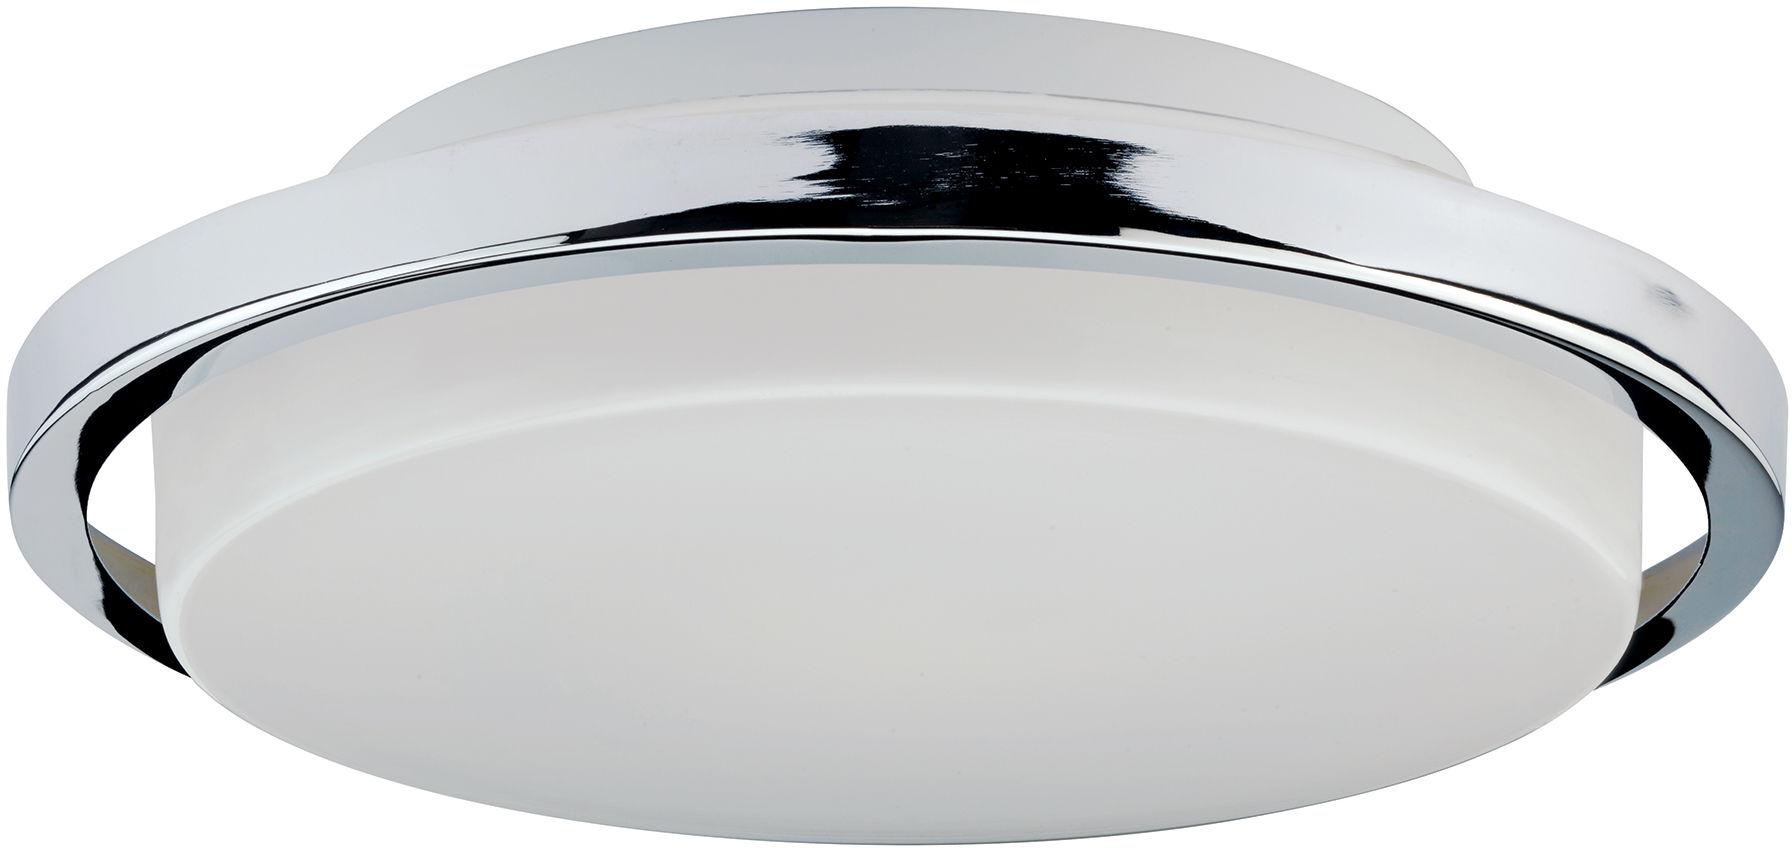 Lampa sufitowa RYDE BATH/RYDE/F IP44 - Elstead Lighting  SPRAWDŹ RABATY  5-10-15-20 % w koszyku